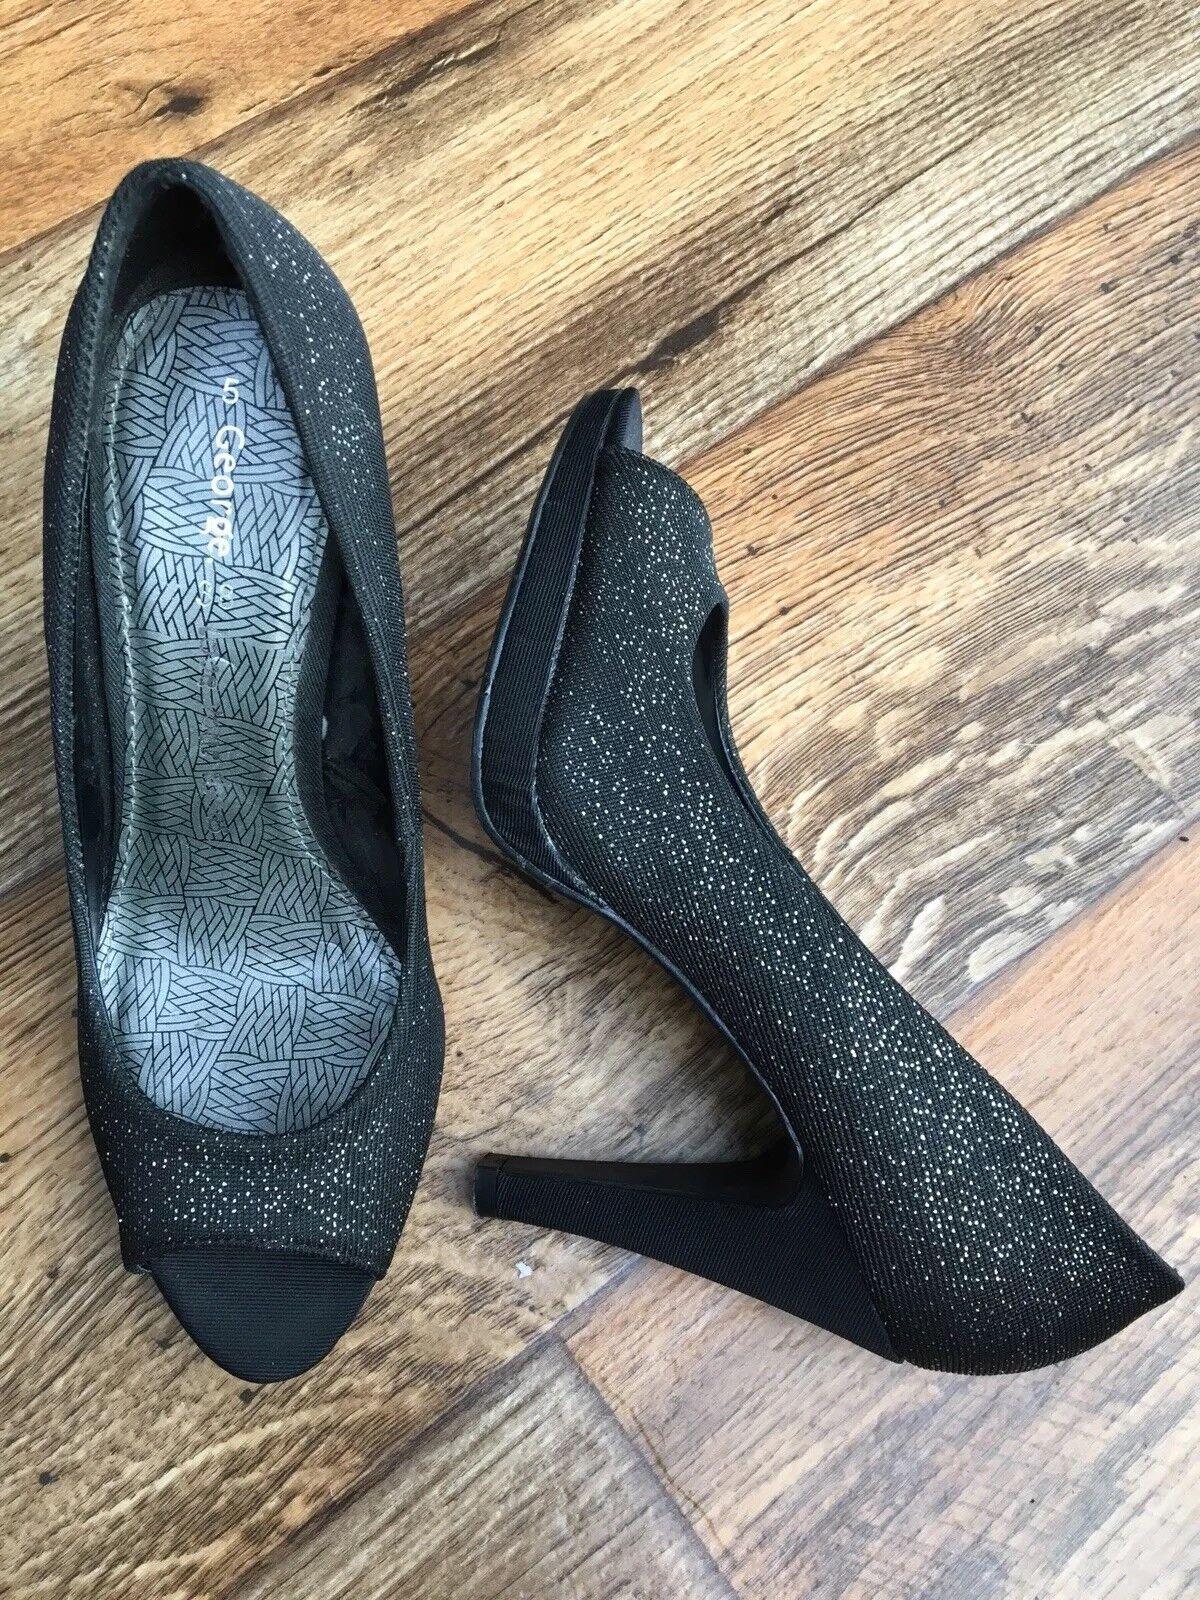 GEORGE Ladies Black Sparkle/Shimme<wbr/>r Peep Toe Shoes UK 5 EUR 38